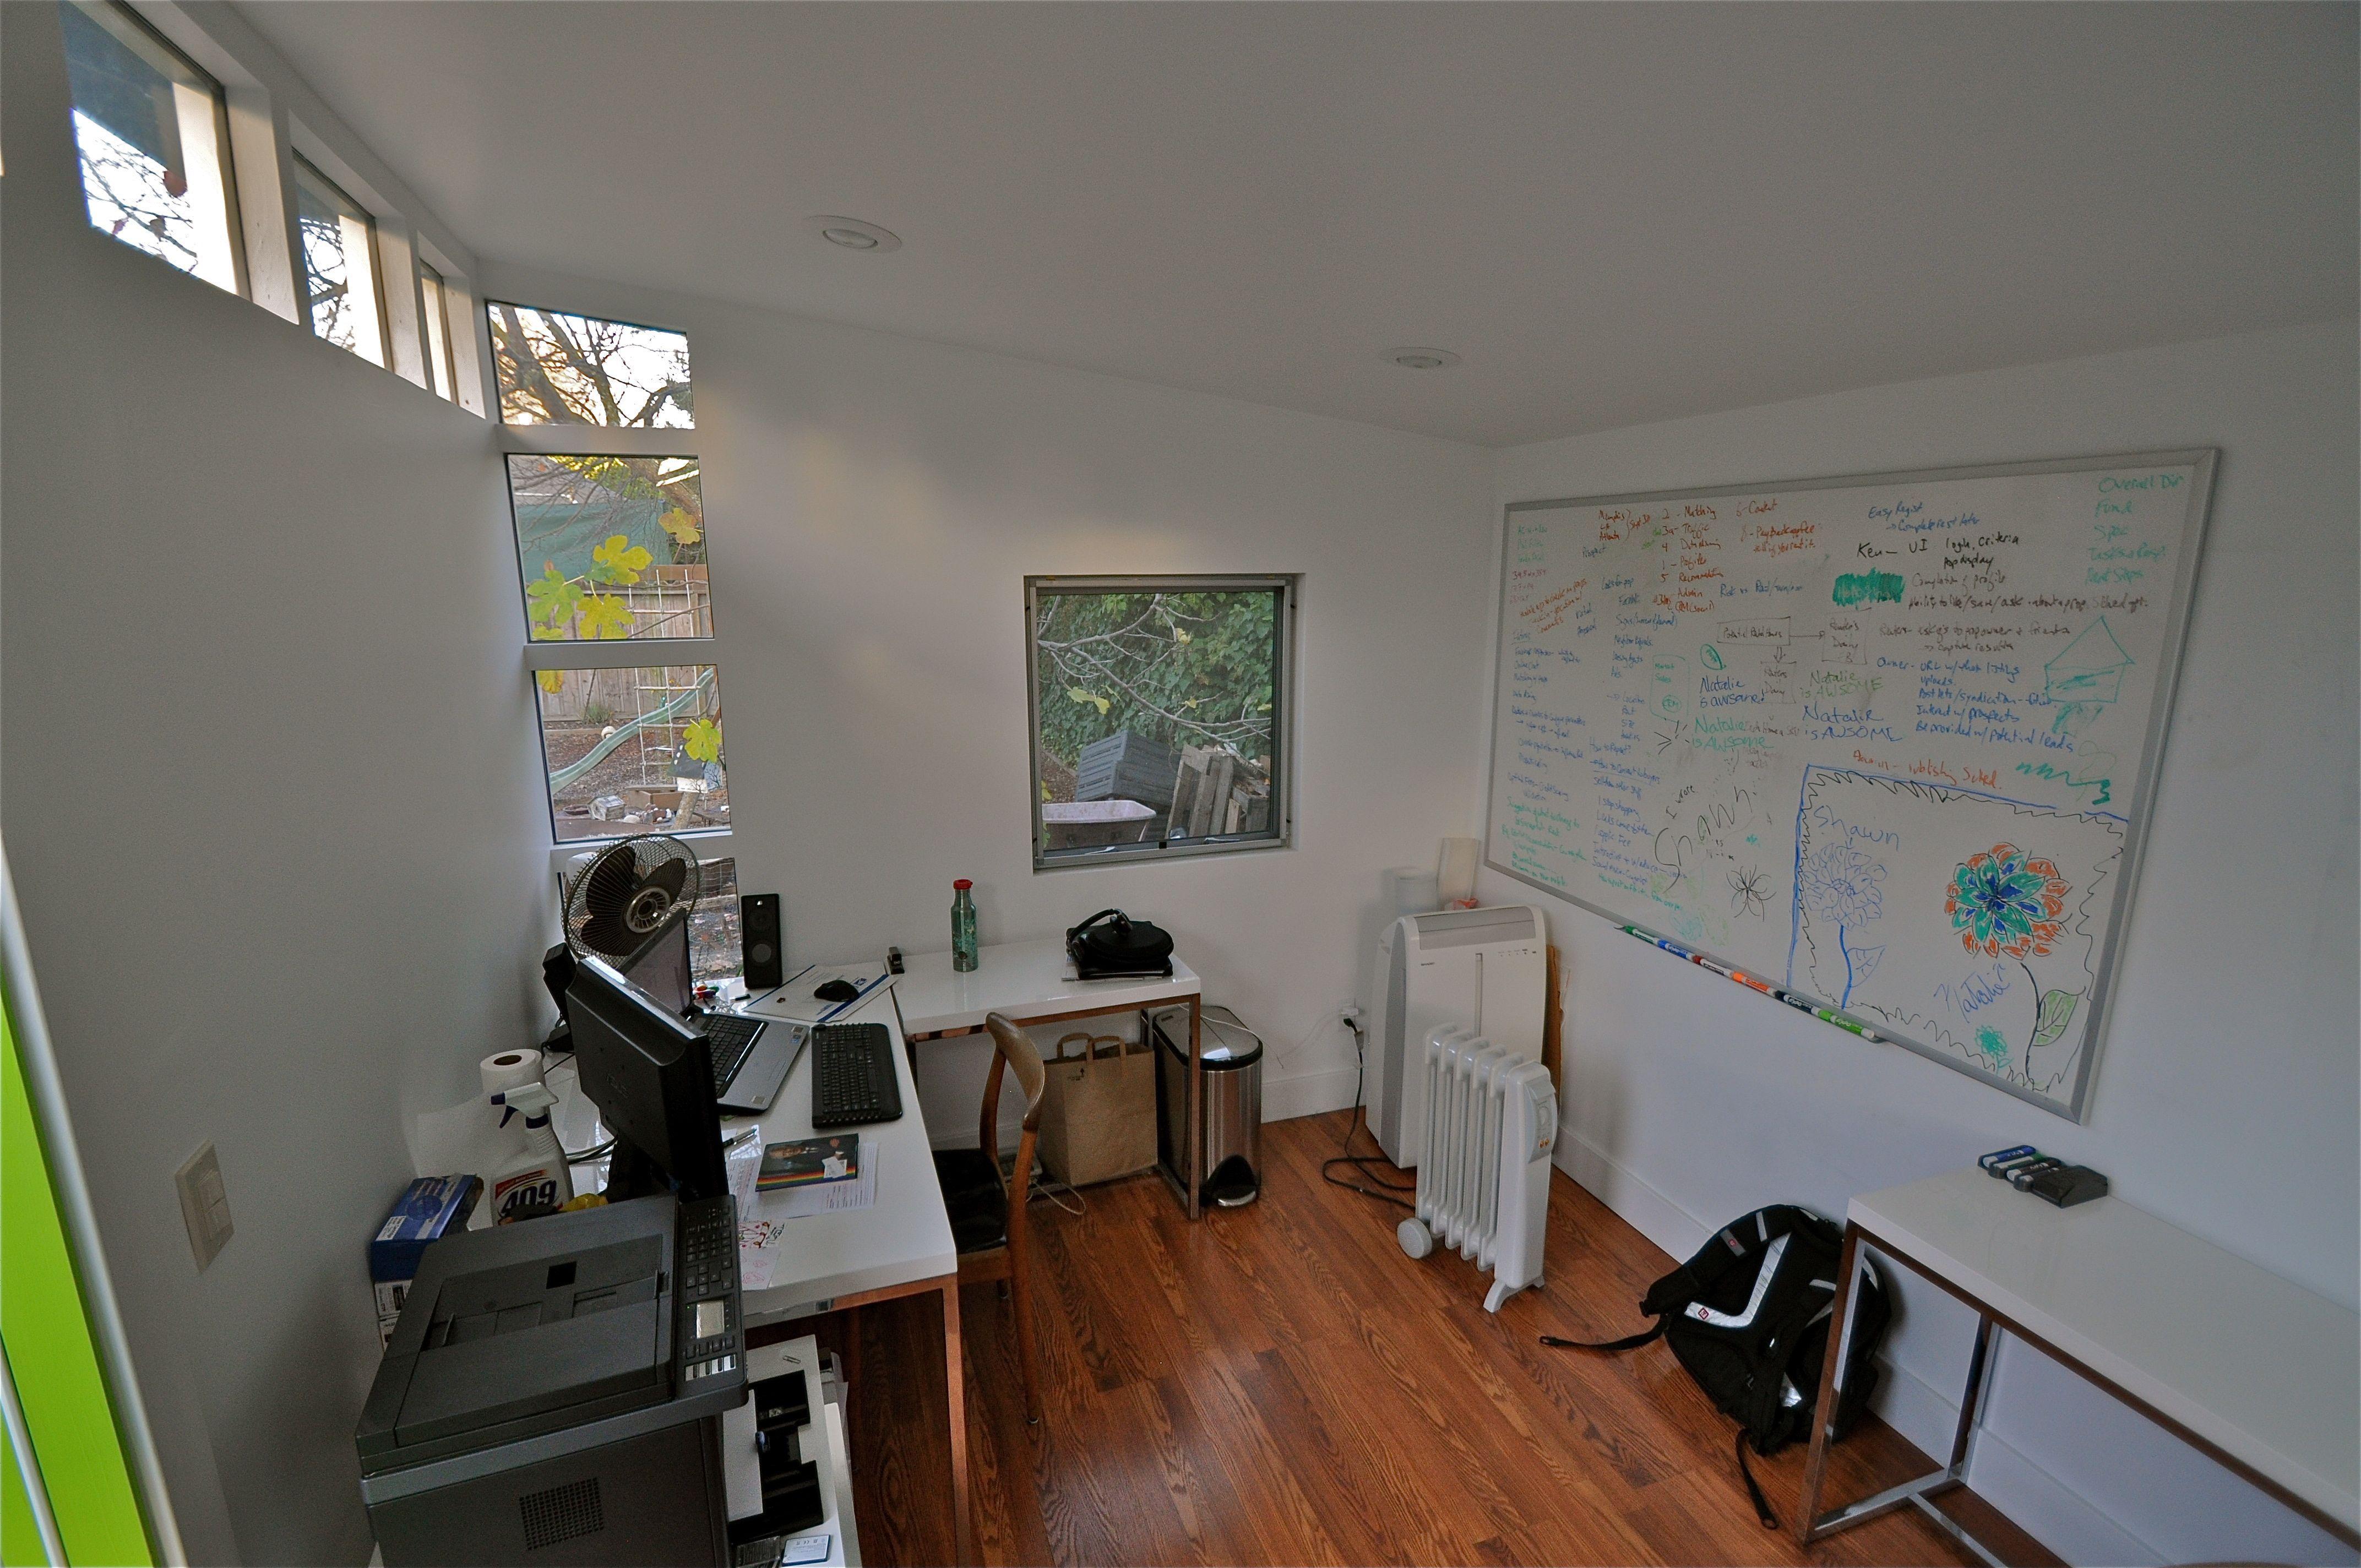 Design & Plan Backyard Sheds & Studios   Modern Prefab Shed Plans ...